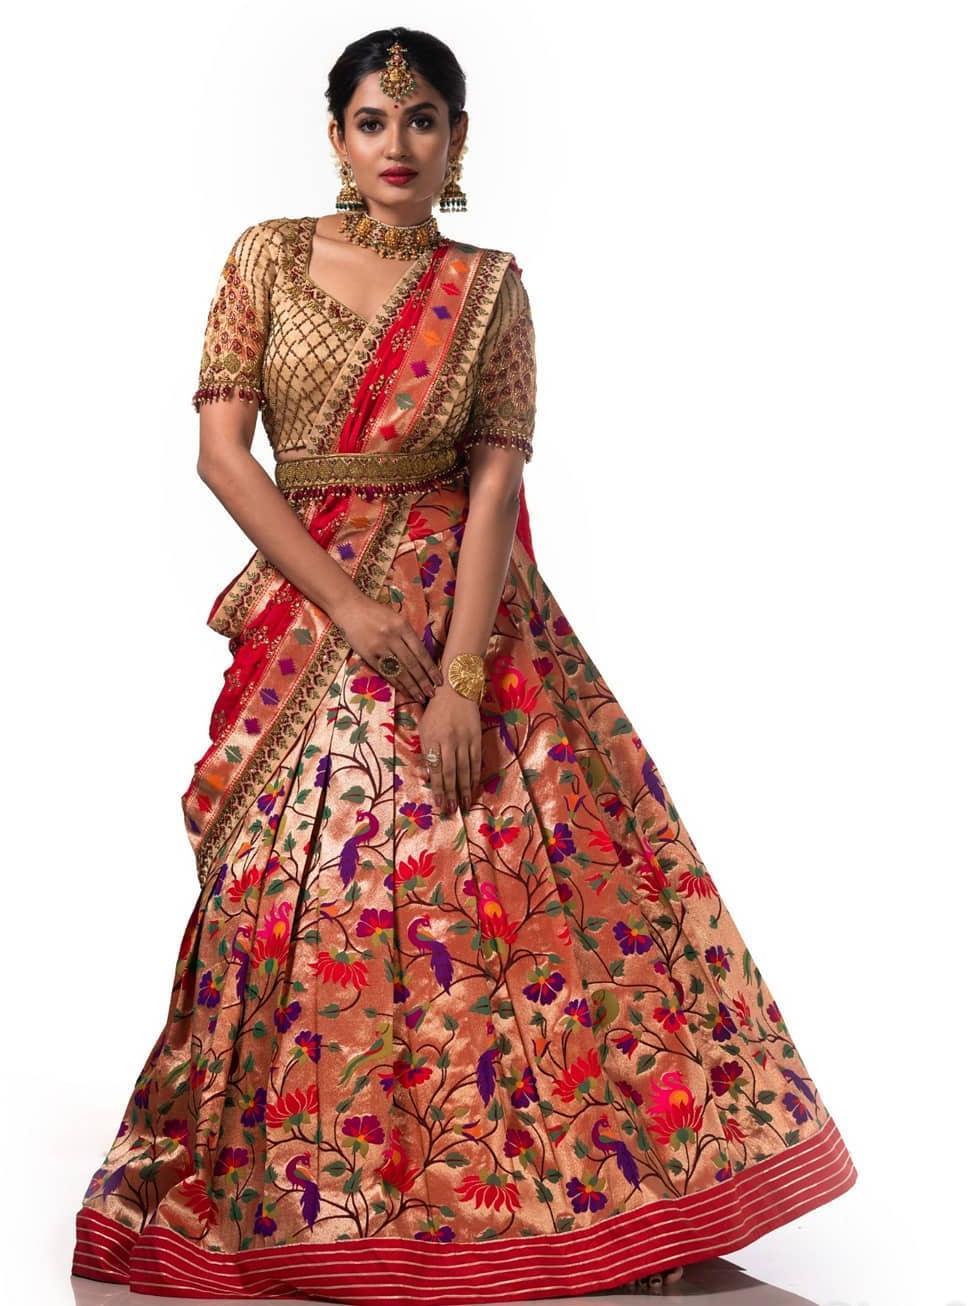 Red-gold paithani half saree by Studio149-1